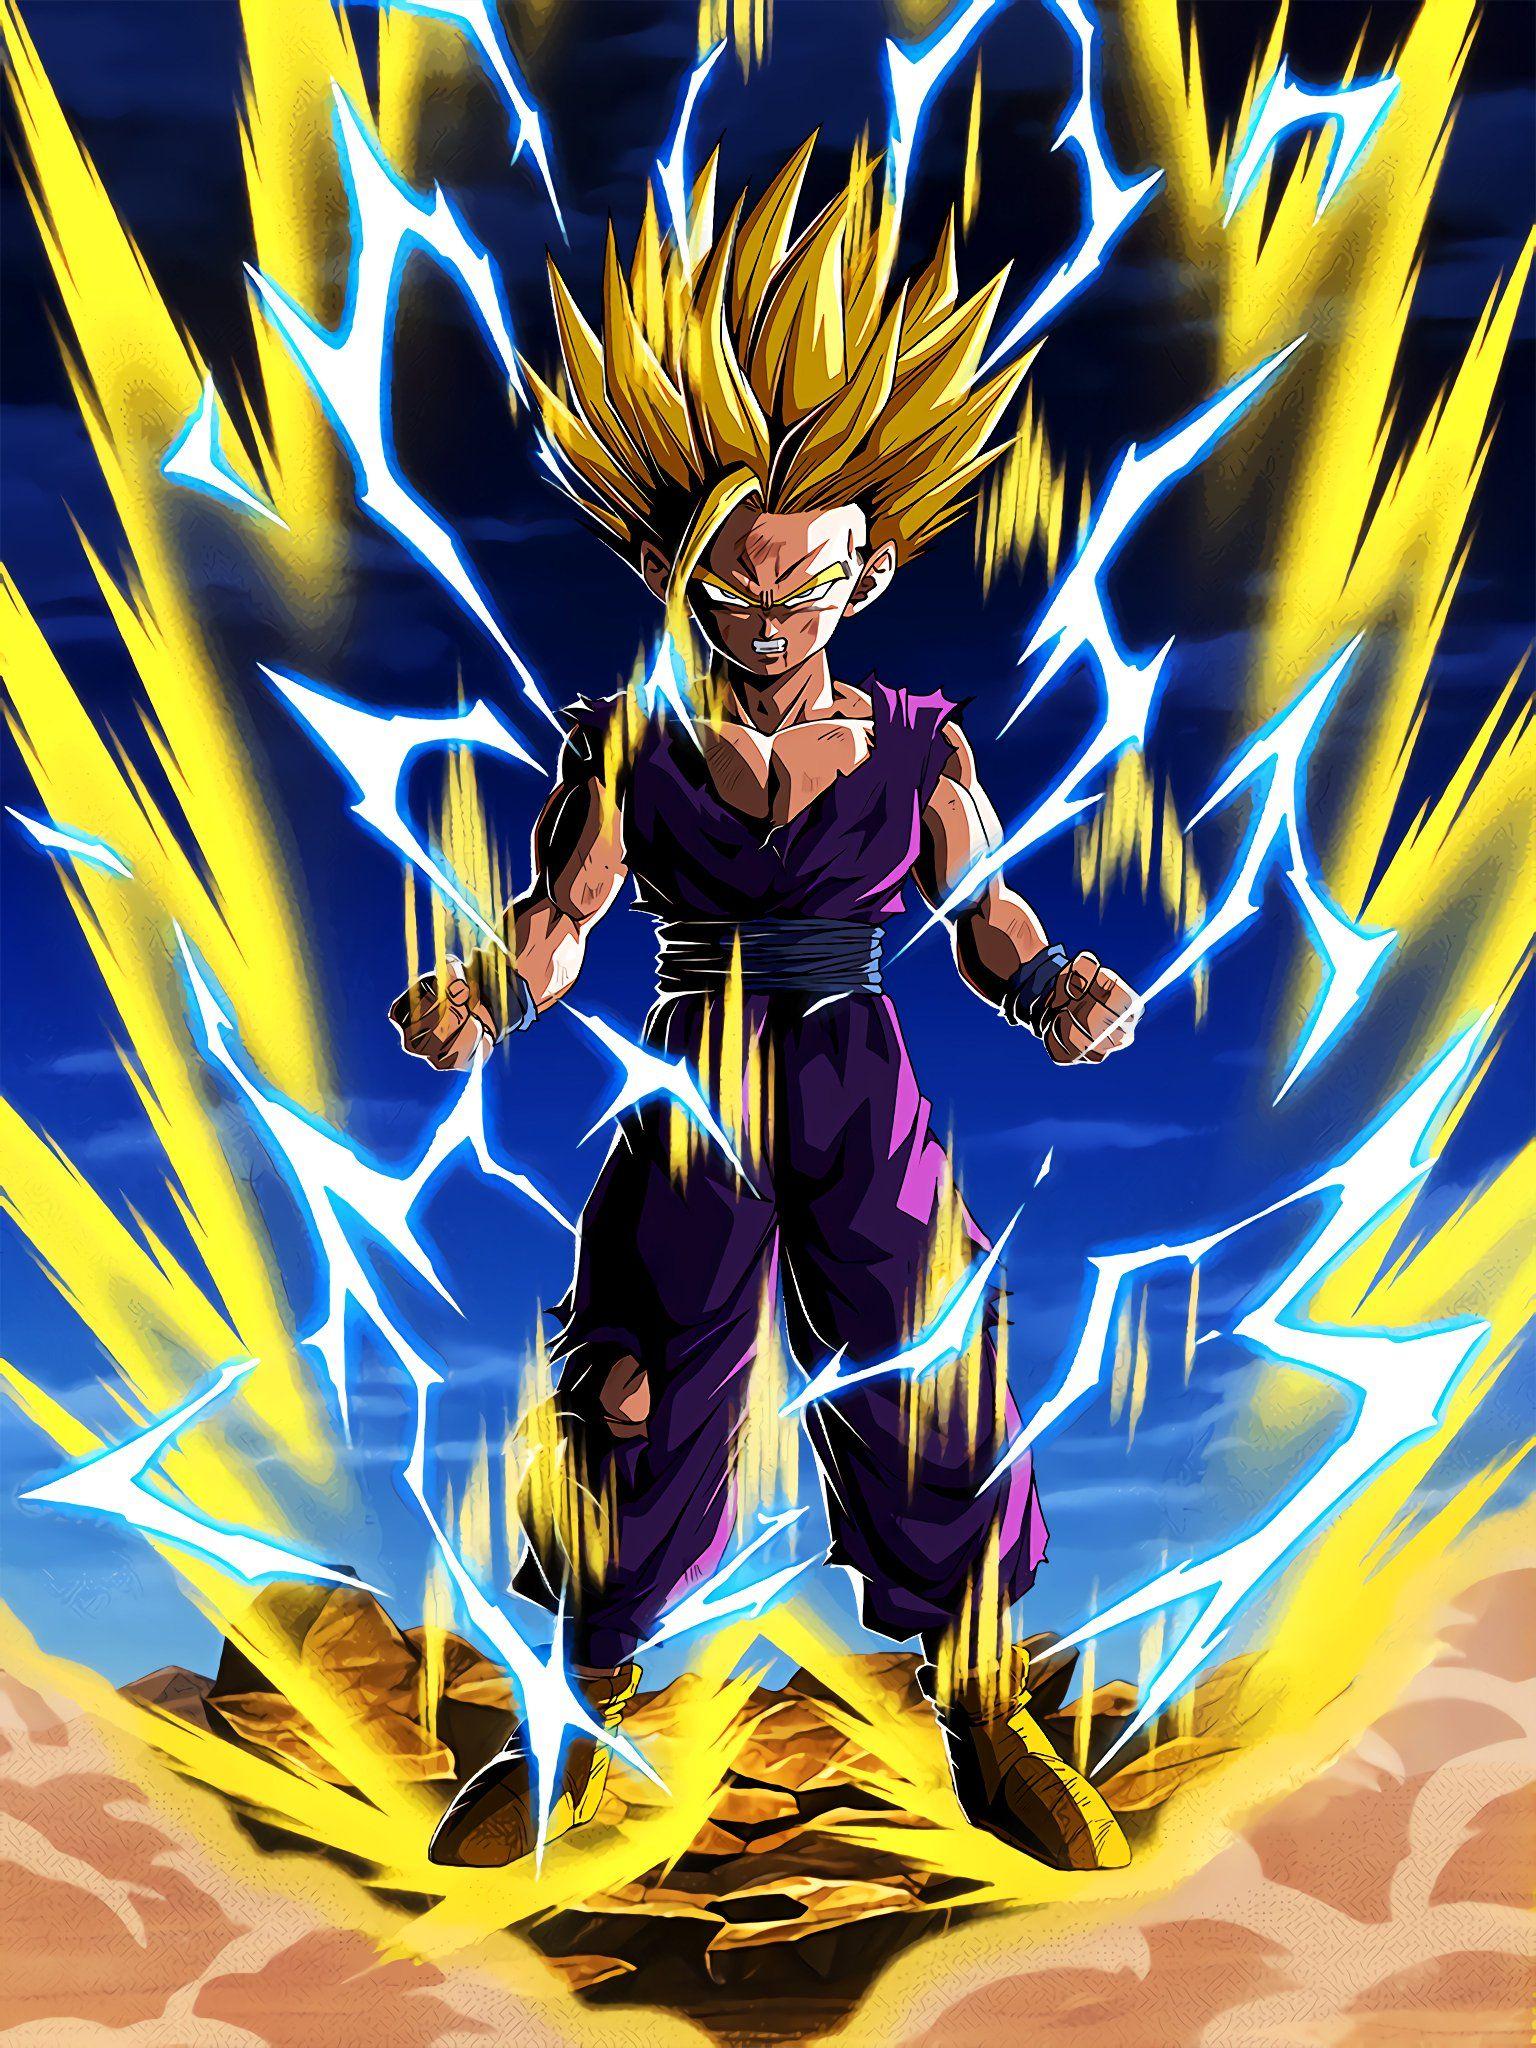 Hydros On Twitter Dragon Ball Super Artwork Dragon Ball Super Manga Anime Dragon Ball Super